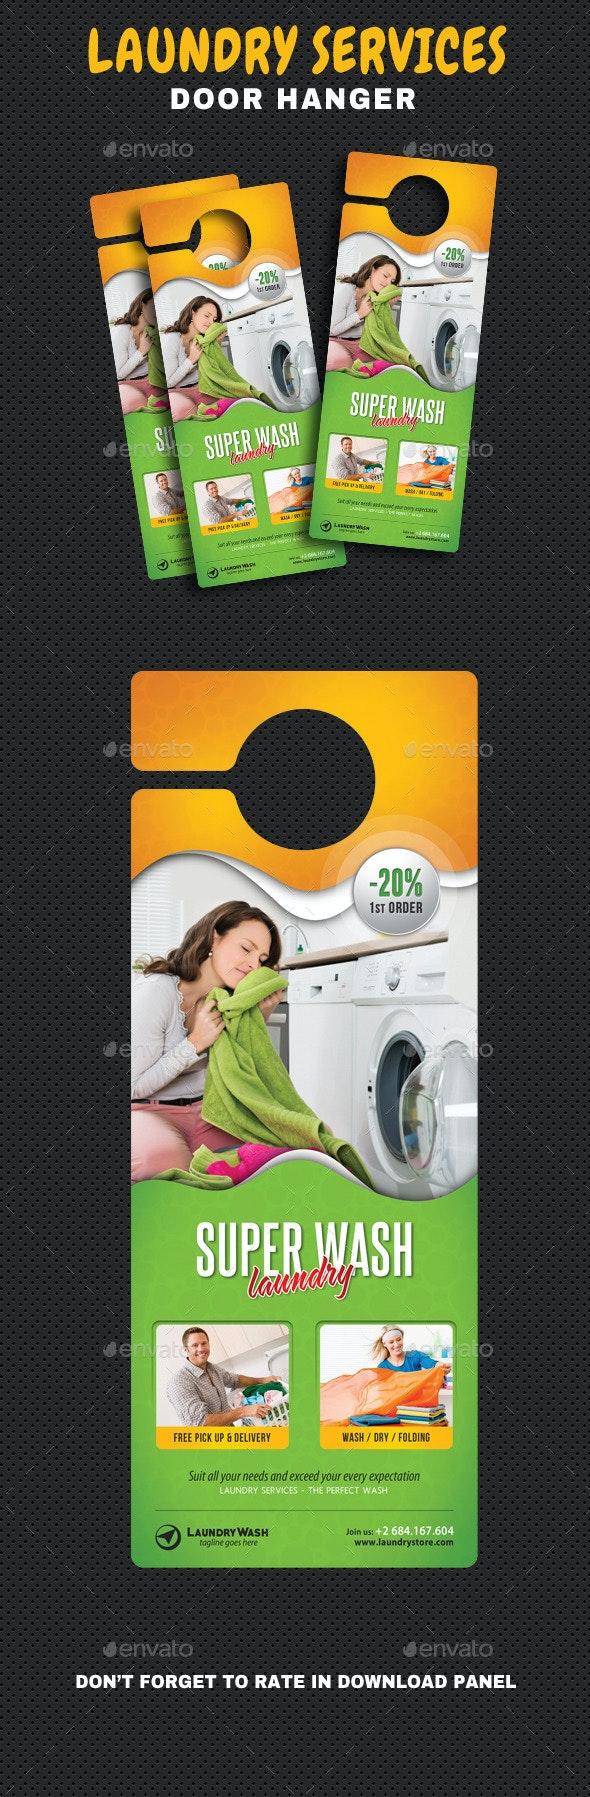 Laundry Services Door Hanger - Miscellaneous Print Templates